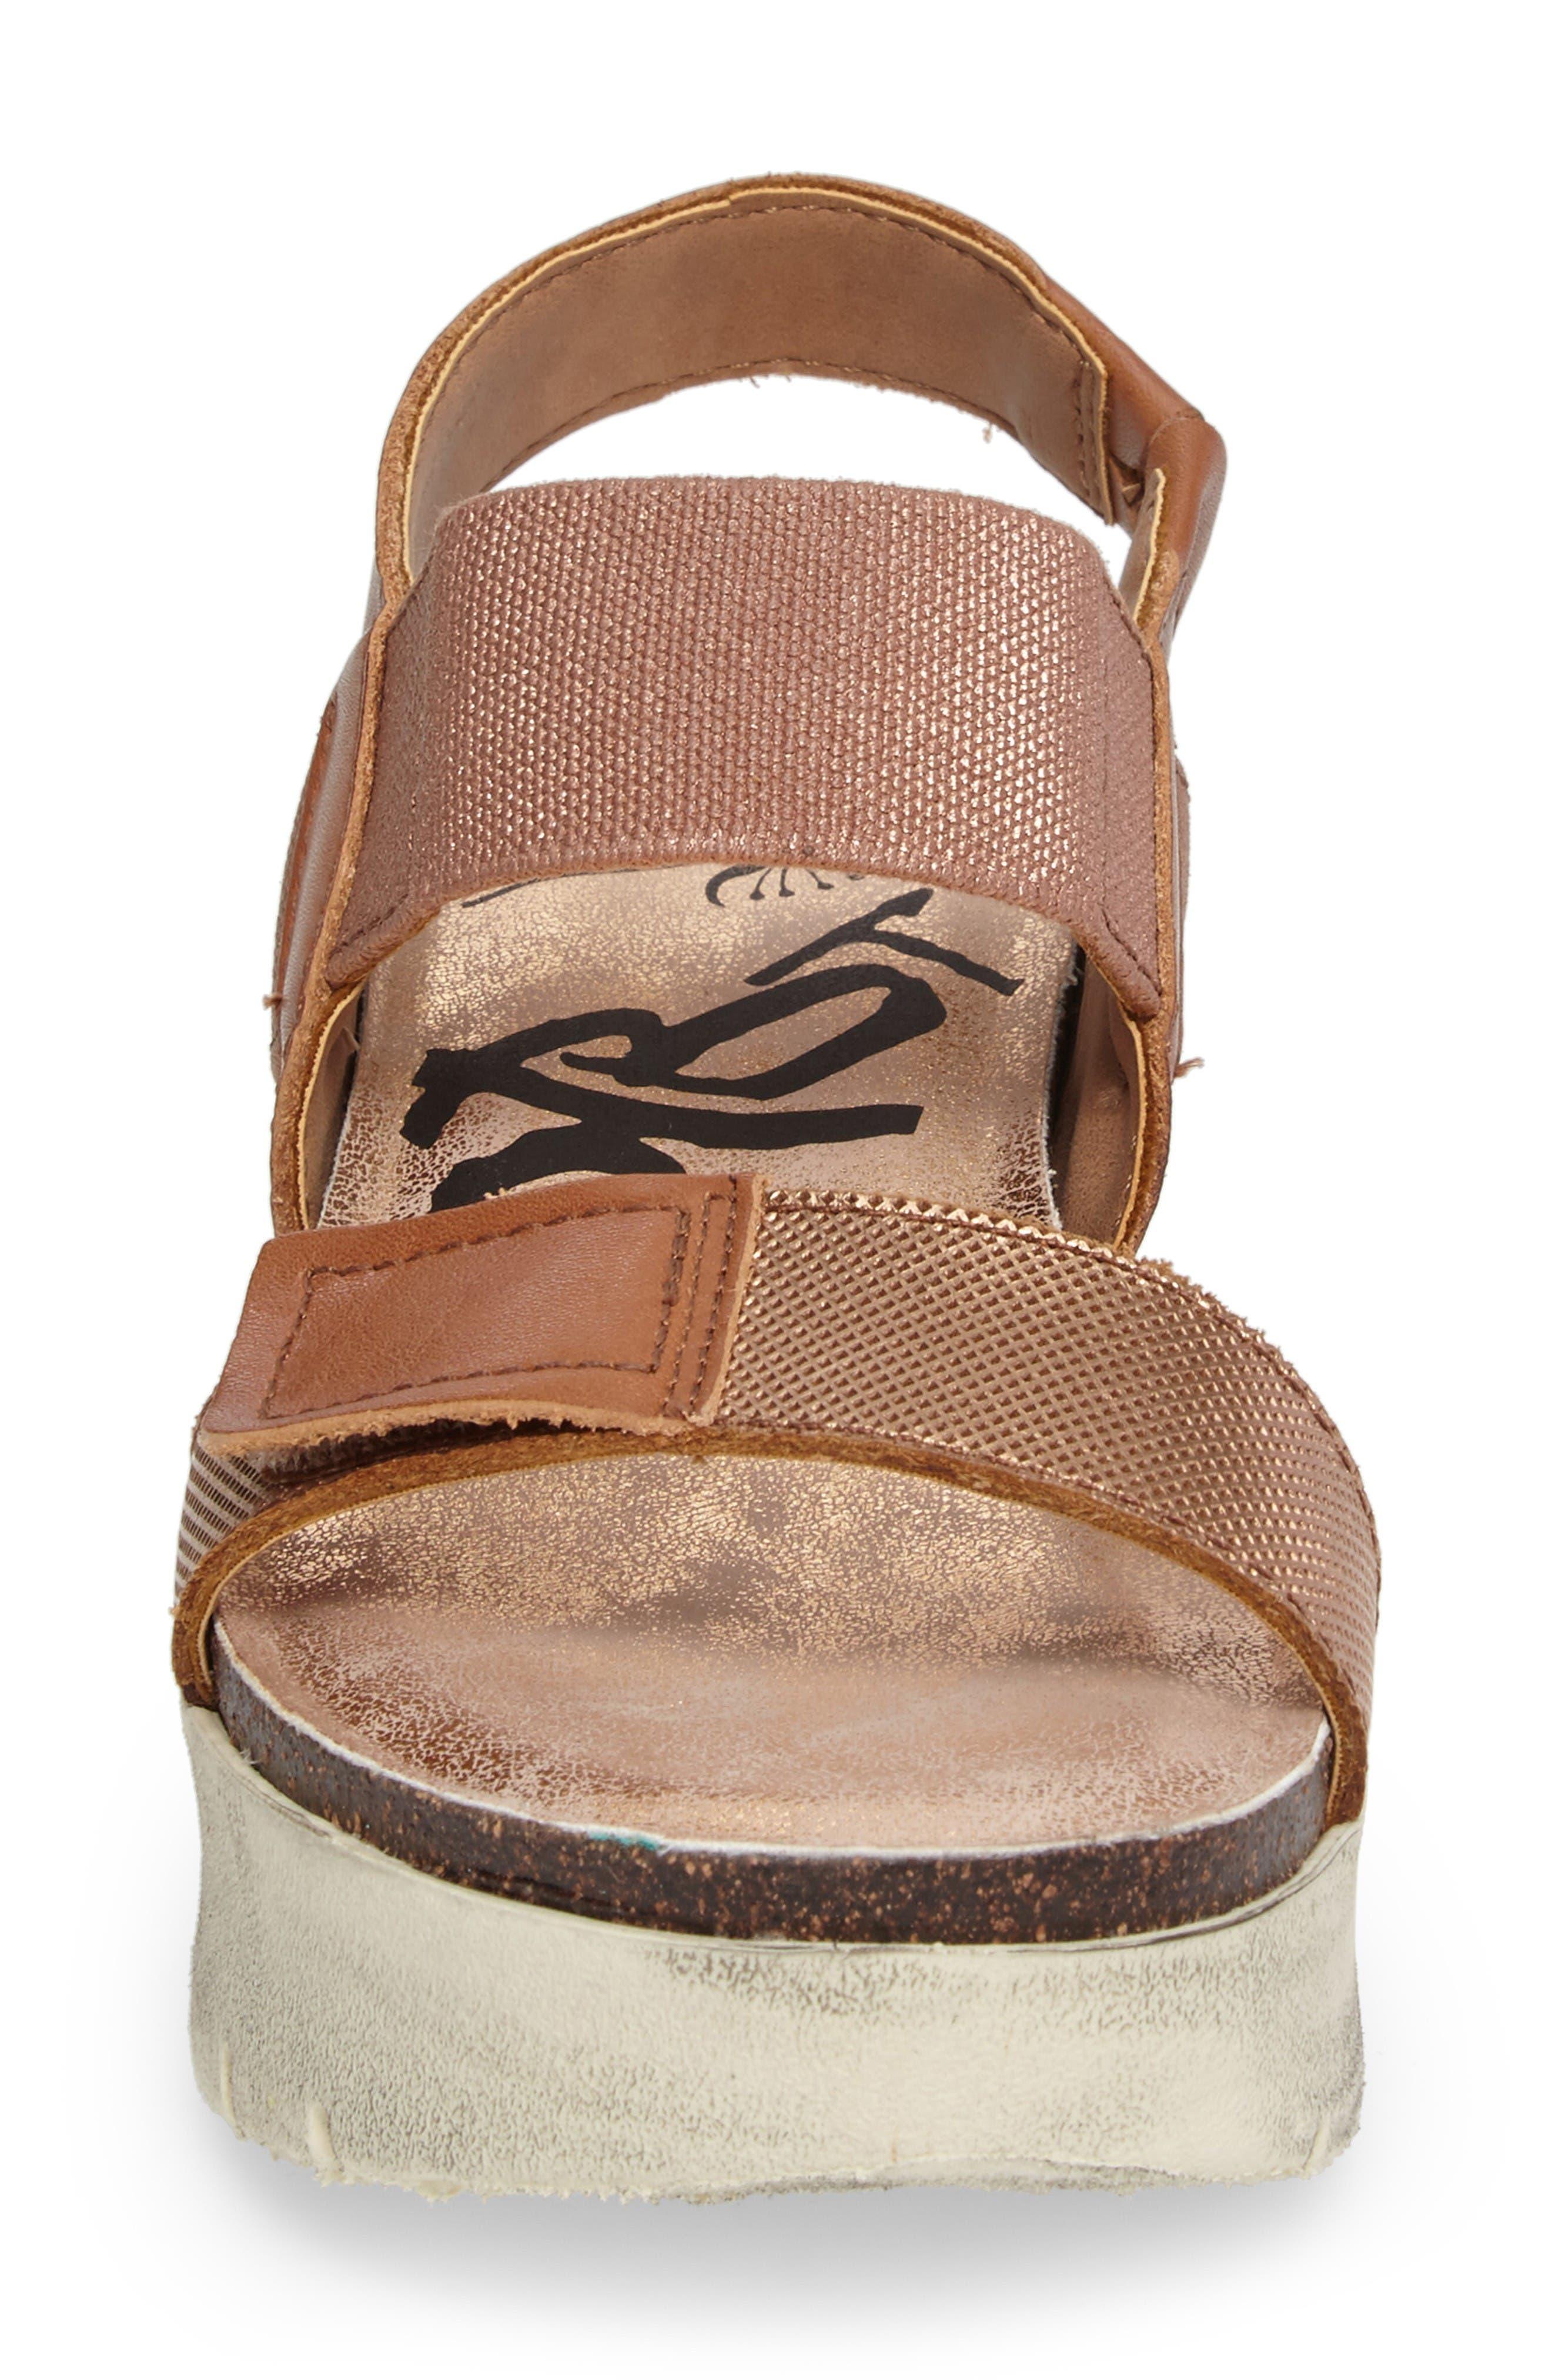 Nova Platform Sandal,                             Alternate thumbnail 4, color,                             Copper Leather